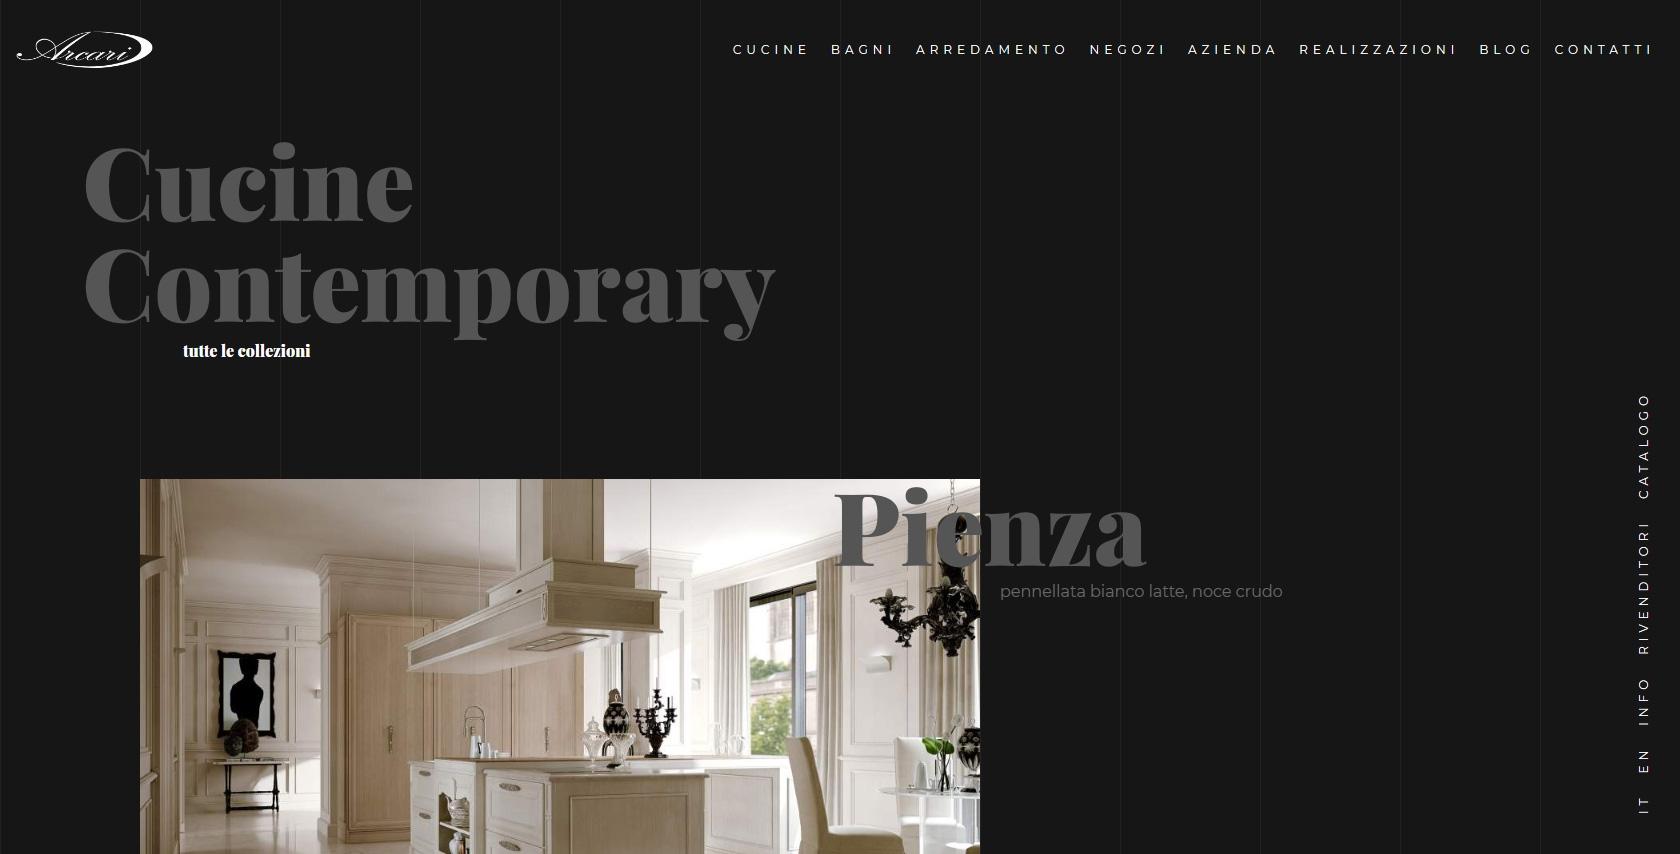 Arcari arredamenti vergani gasco interactive web agency for Vergani arredamenti